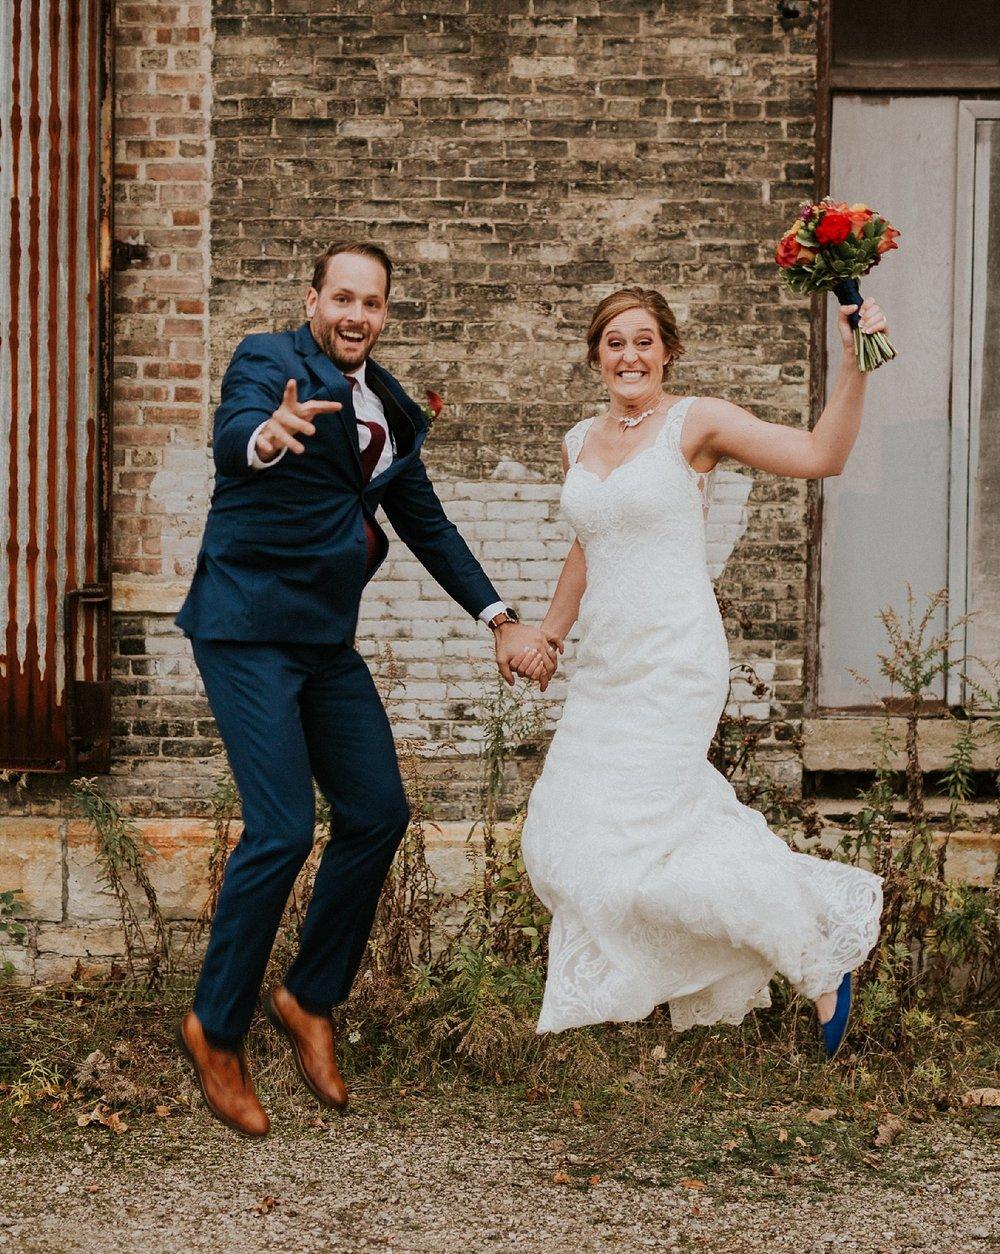 Vince-Caitlin_Milwaukee-South-Second-wedding_liller-photo_0064.jpg